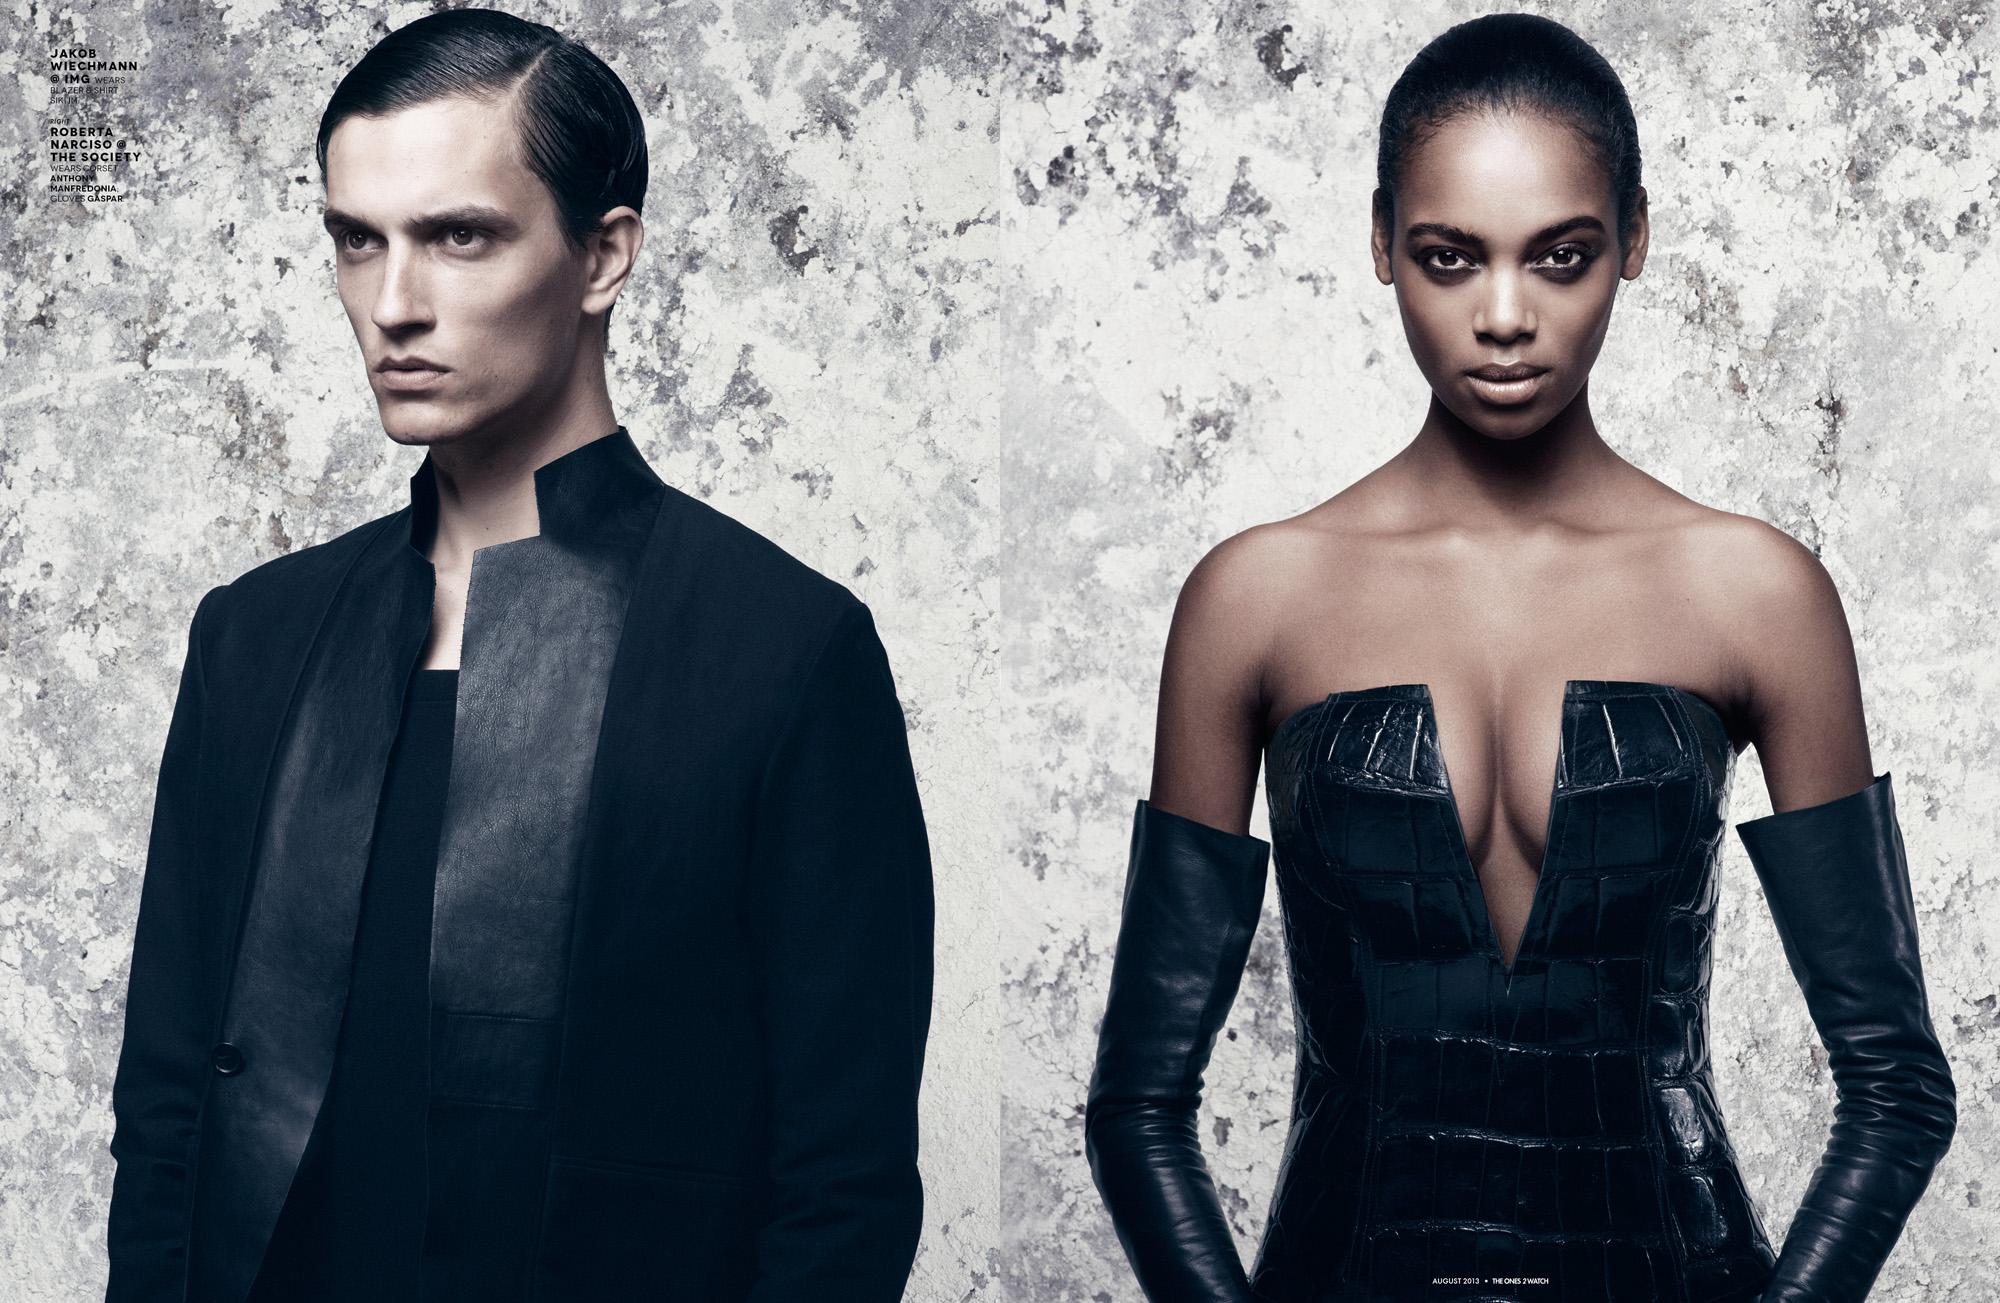 Jakob Wiechmann @ IMG wears blazer & shirt Siki Im.  Right: Roberta Narciso @ The Society wears corset Anthony Manfredonia; gloves Gaspar.